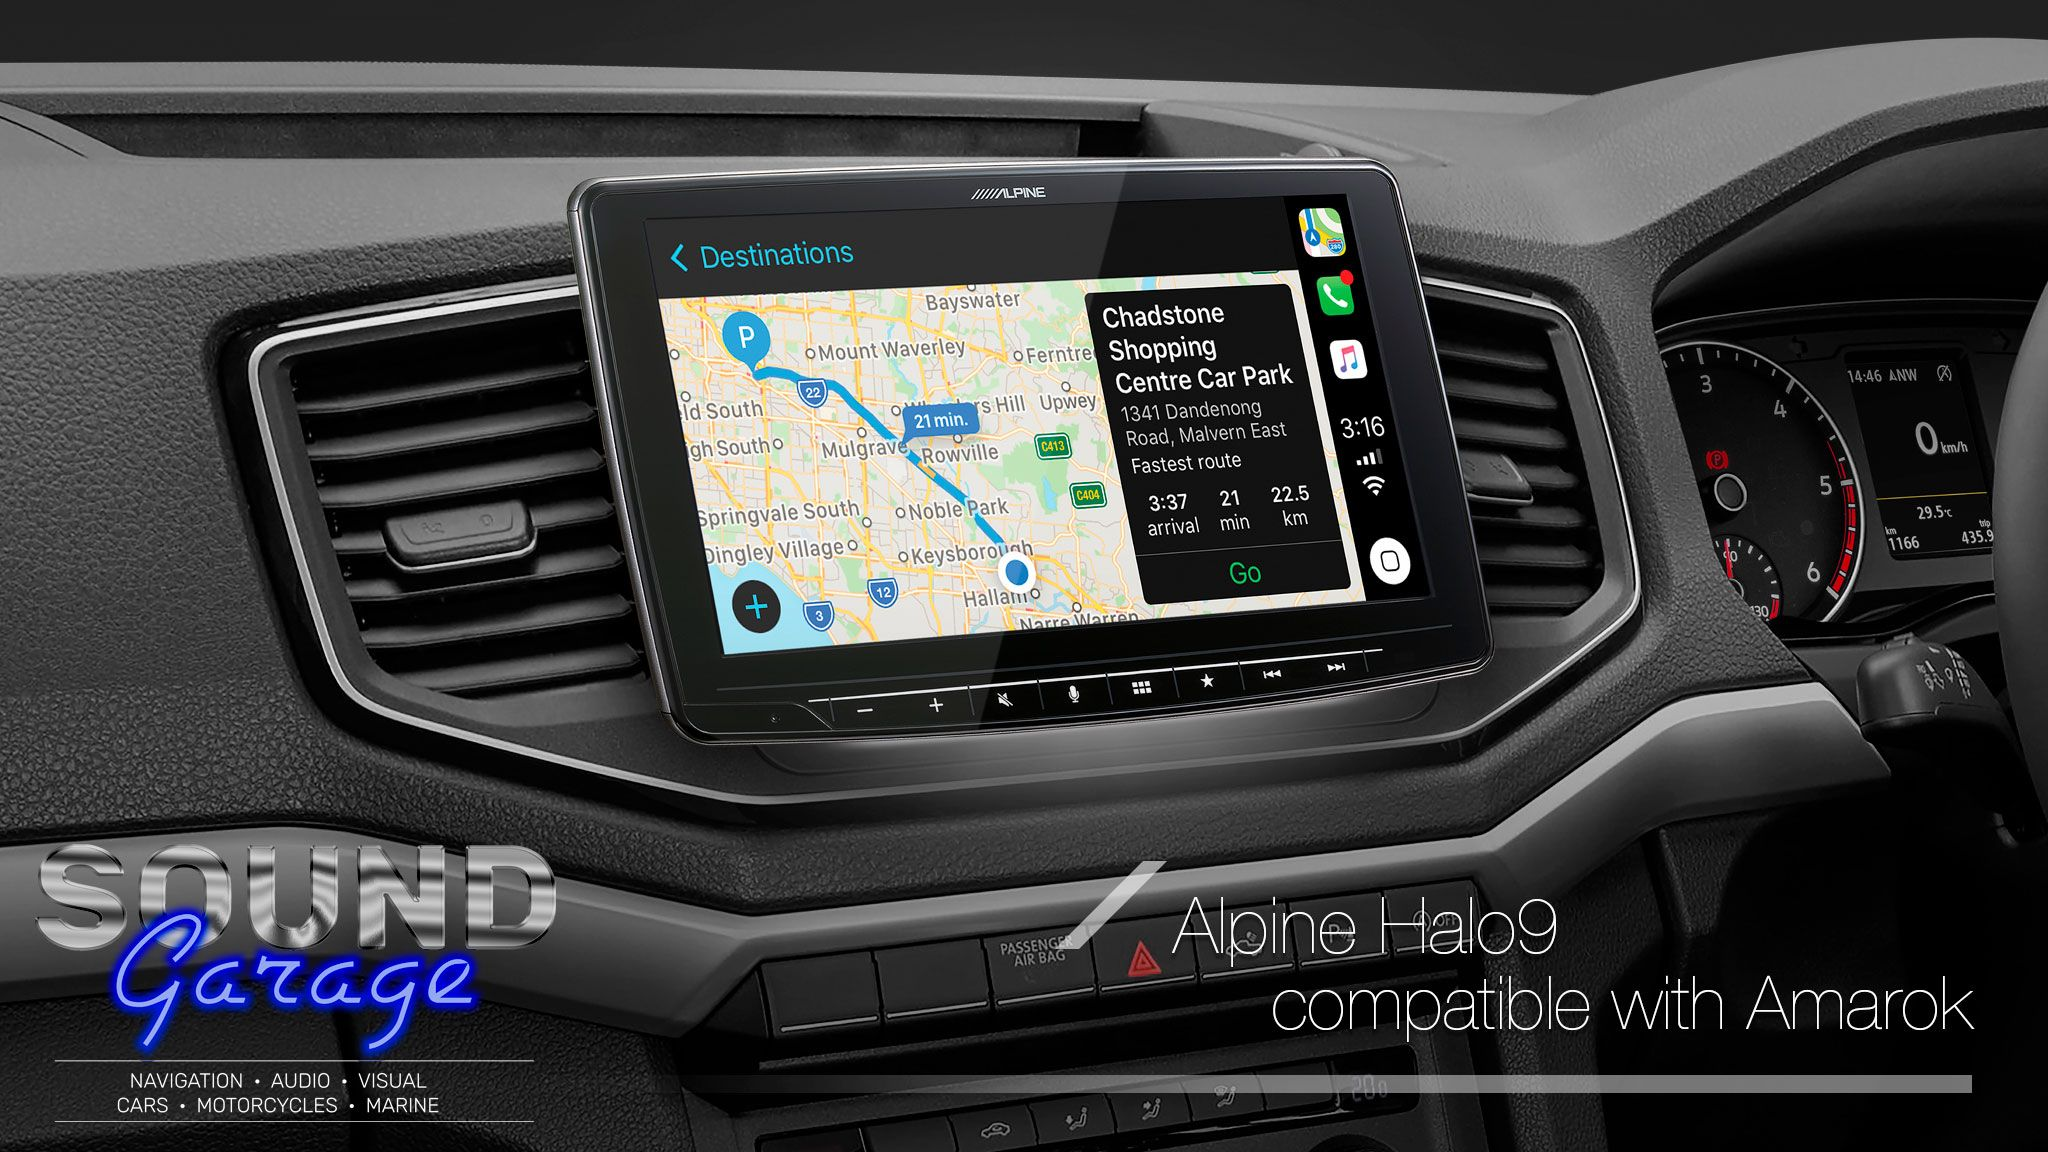 Alpine Hilux15 F309e Compatible With Toyota Hilux 2015 2021 Sound Garage Apple Car Play Car Parking Alpine